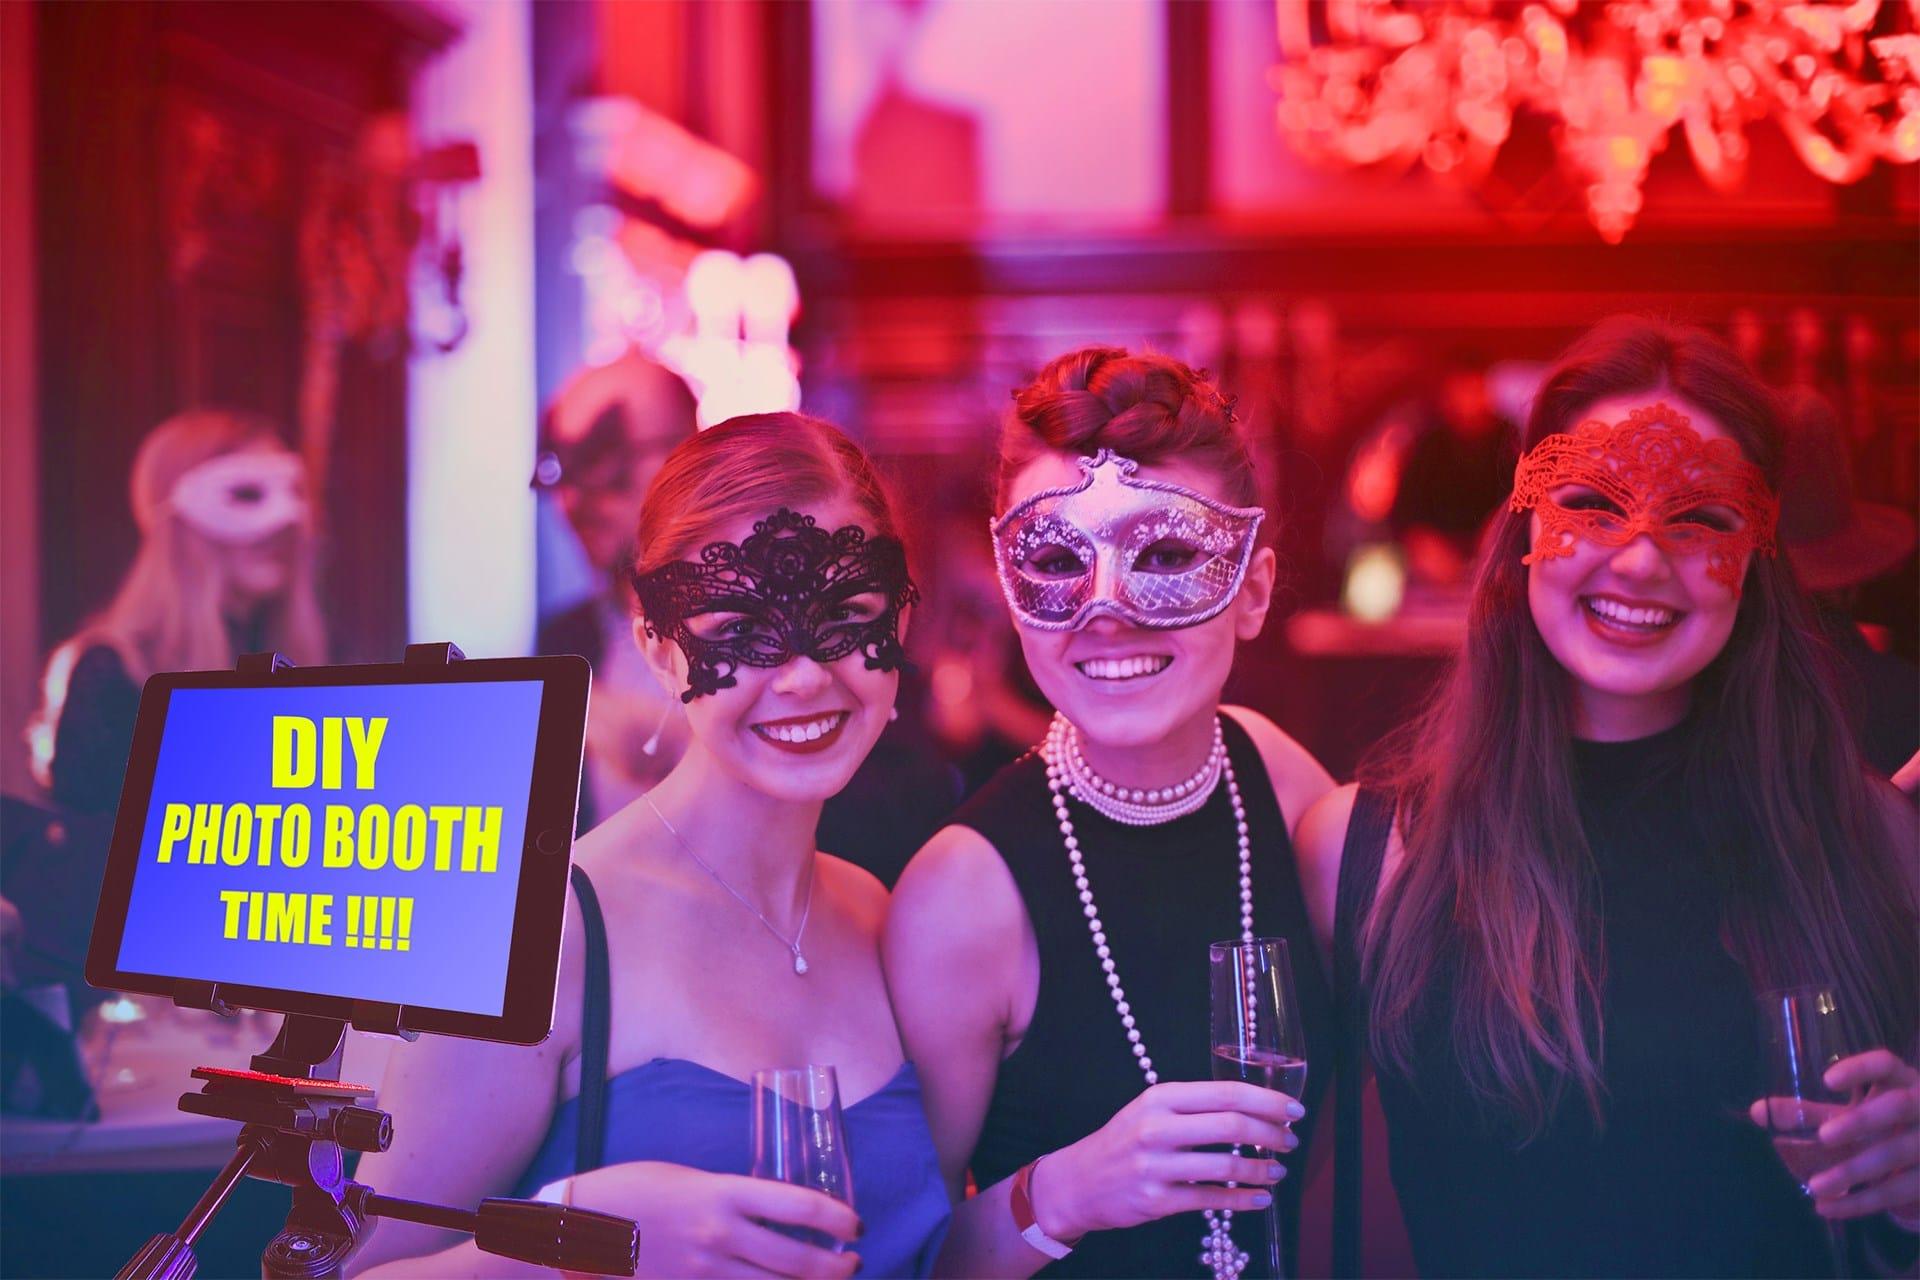 DIY Photo Booth iPad Tablet Cheap Tripod 3 women masqurage Party